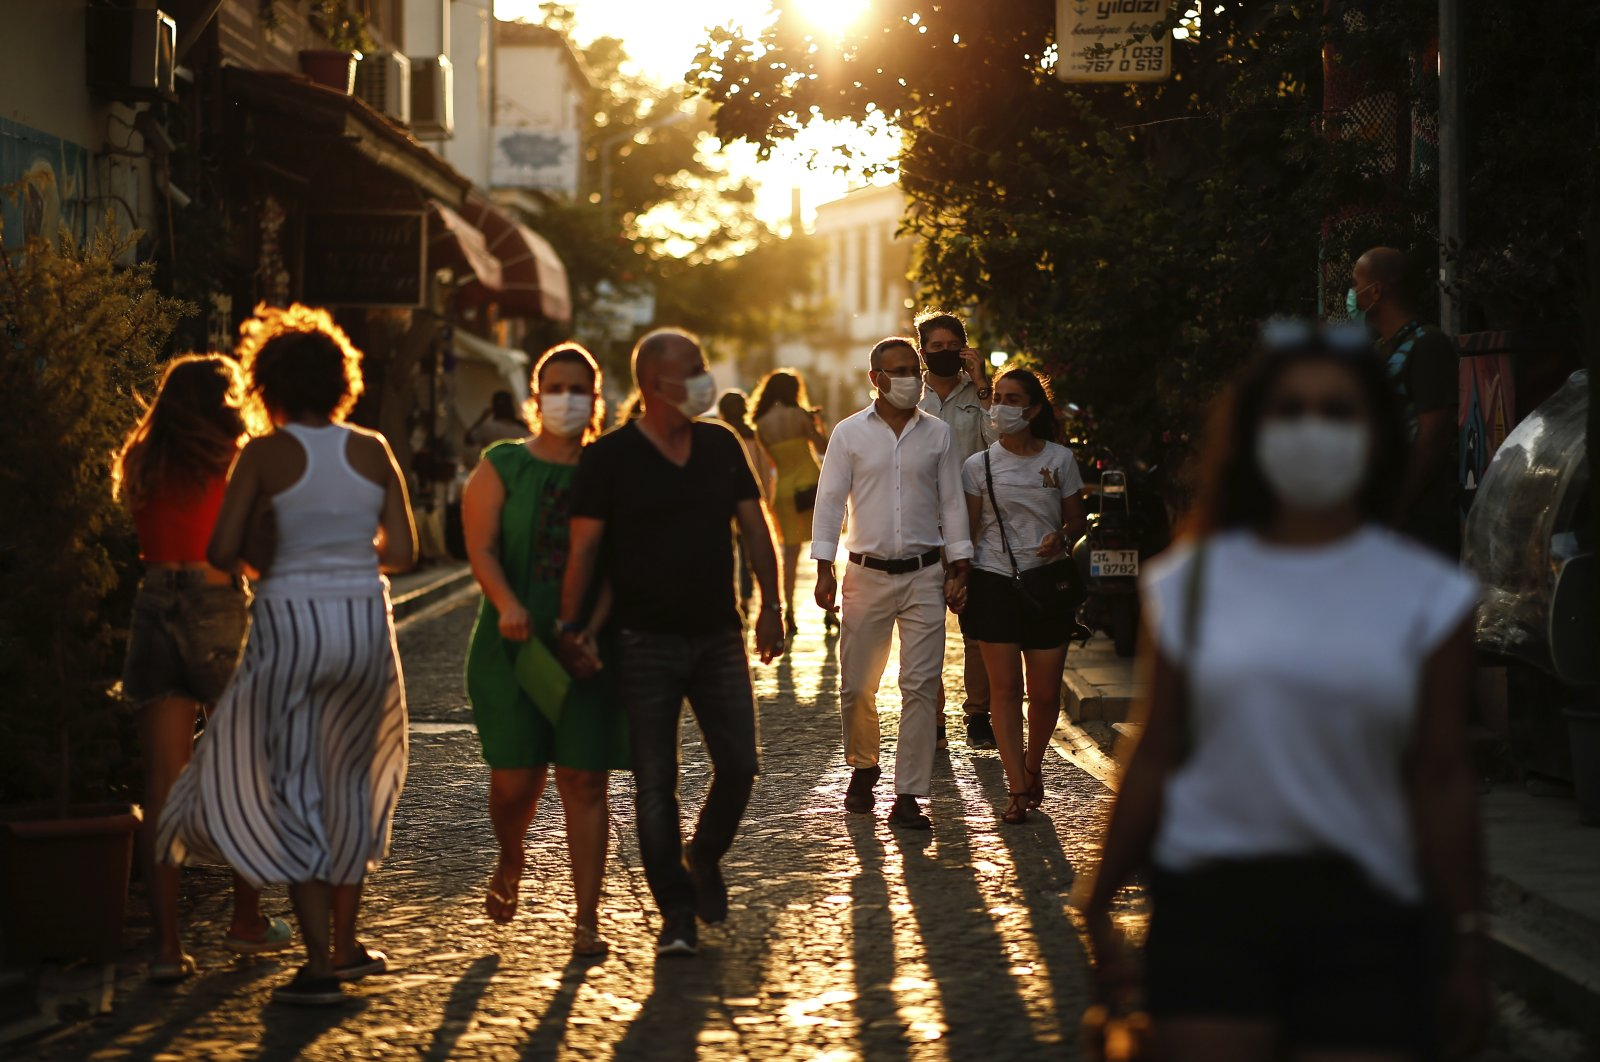 Tourists wearing protective masks walk on a street, in Ayvalık, a town in Balıkesir, western Turkey, Sept. 9, 2020. (AP Photo)